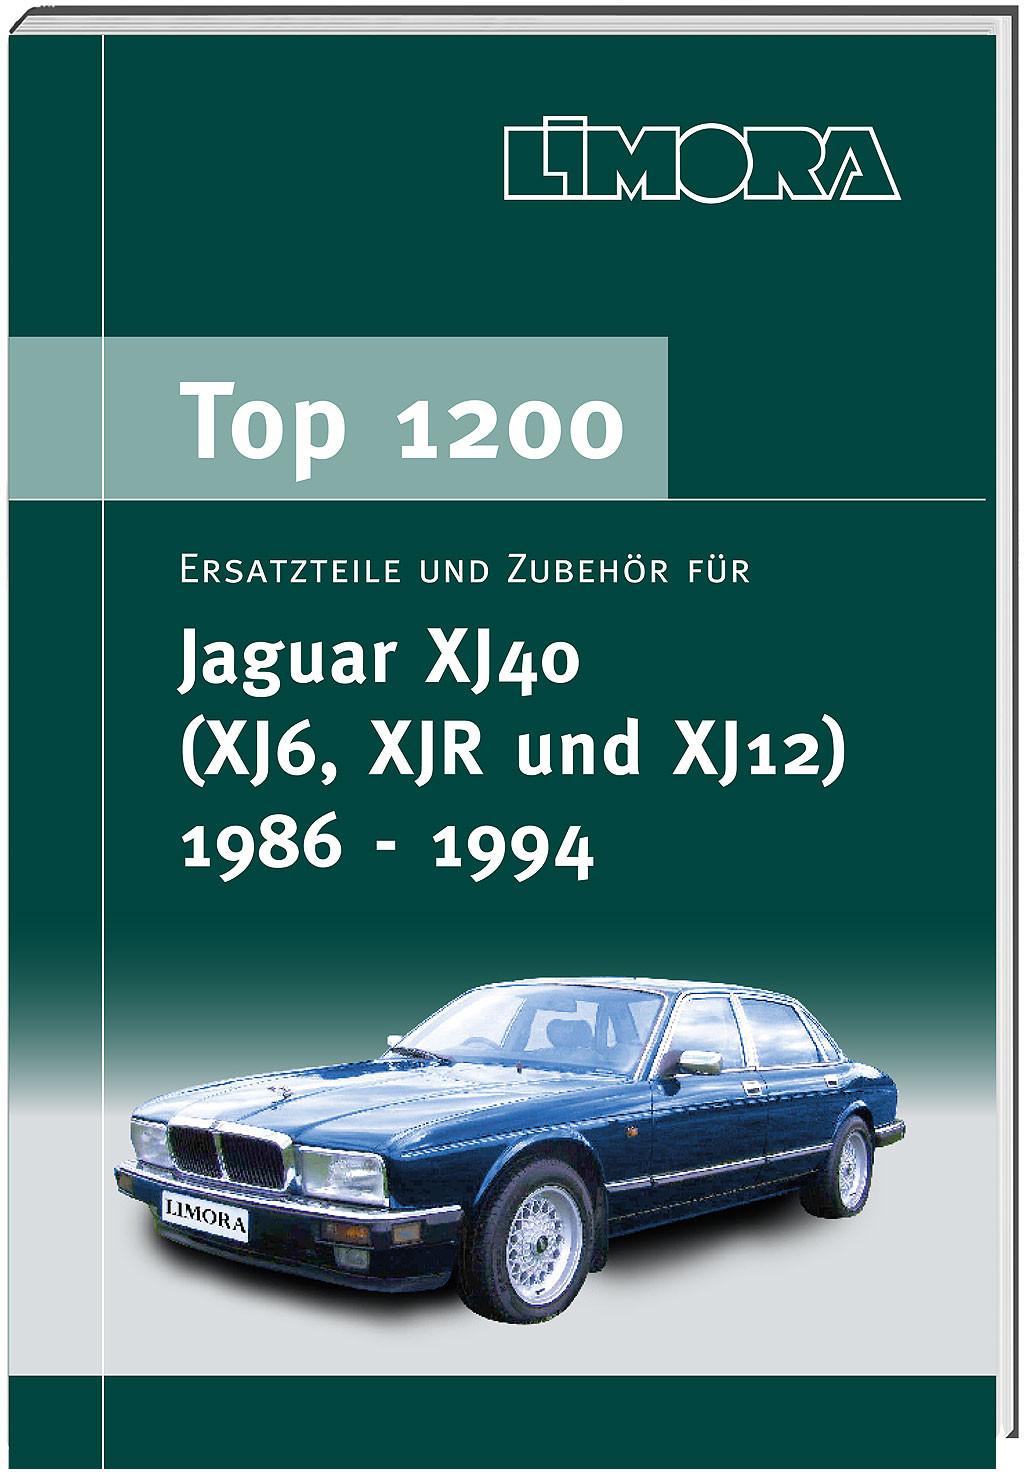 Jaguar Parts catalogue